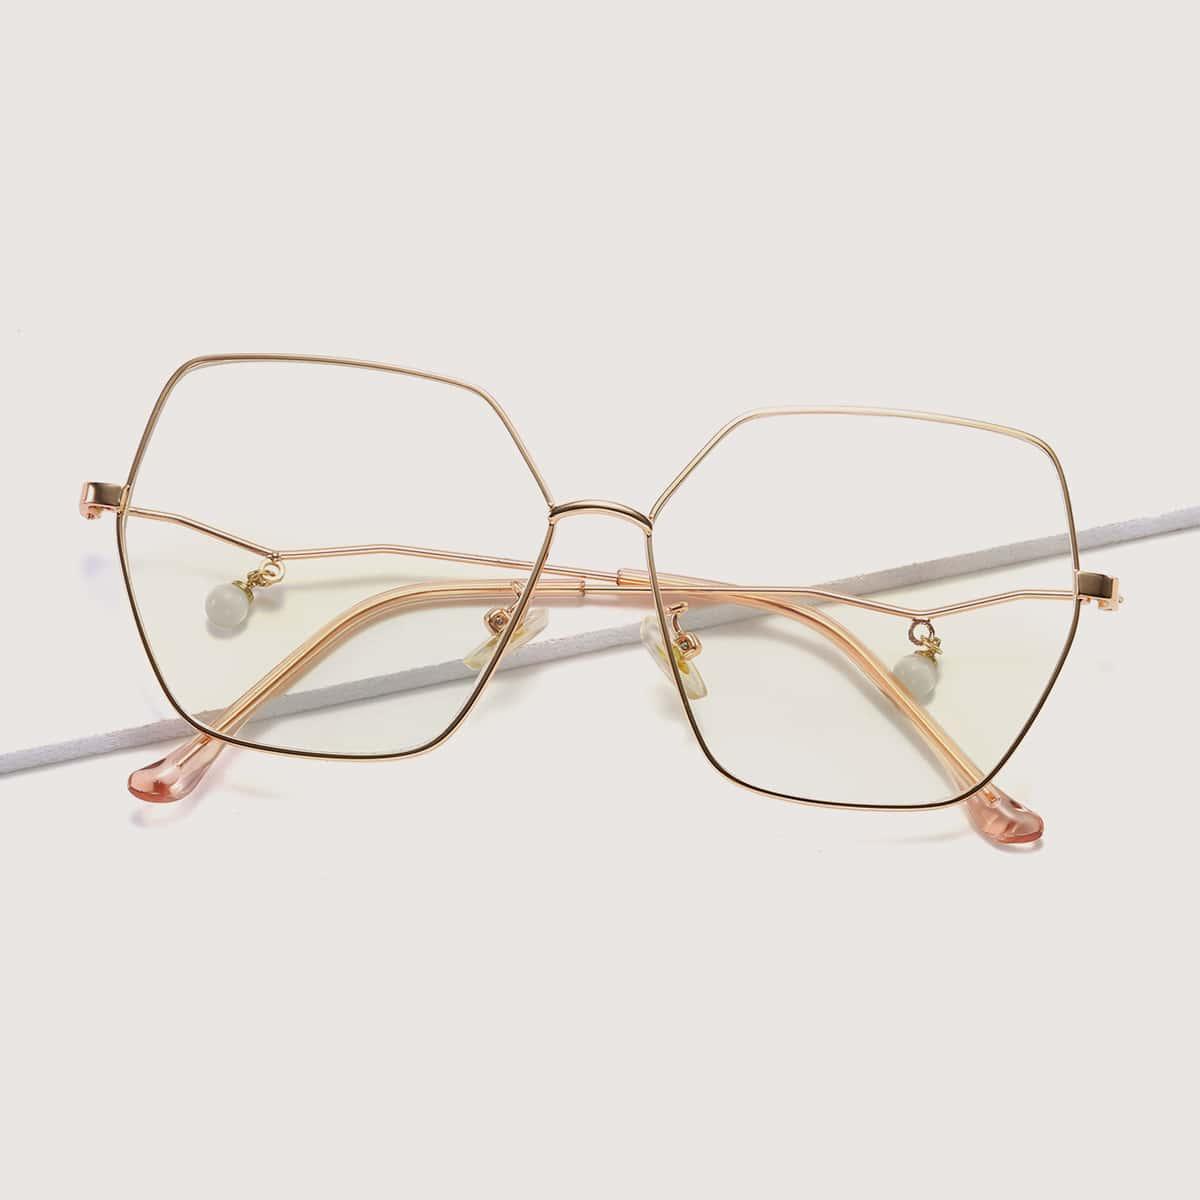 Очки с металлическим каркасом фото